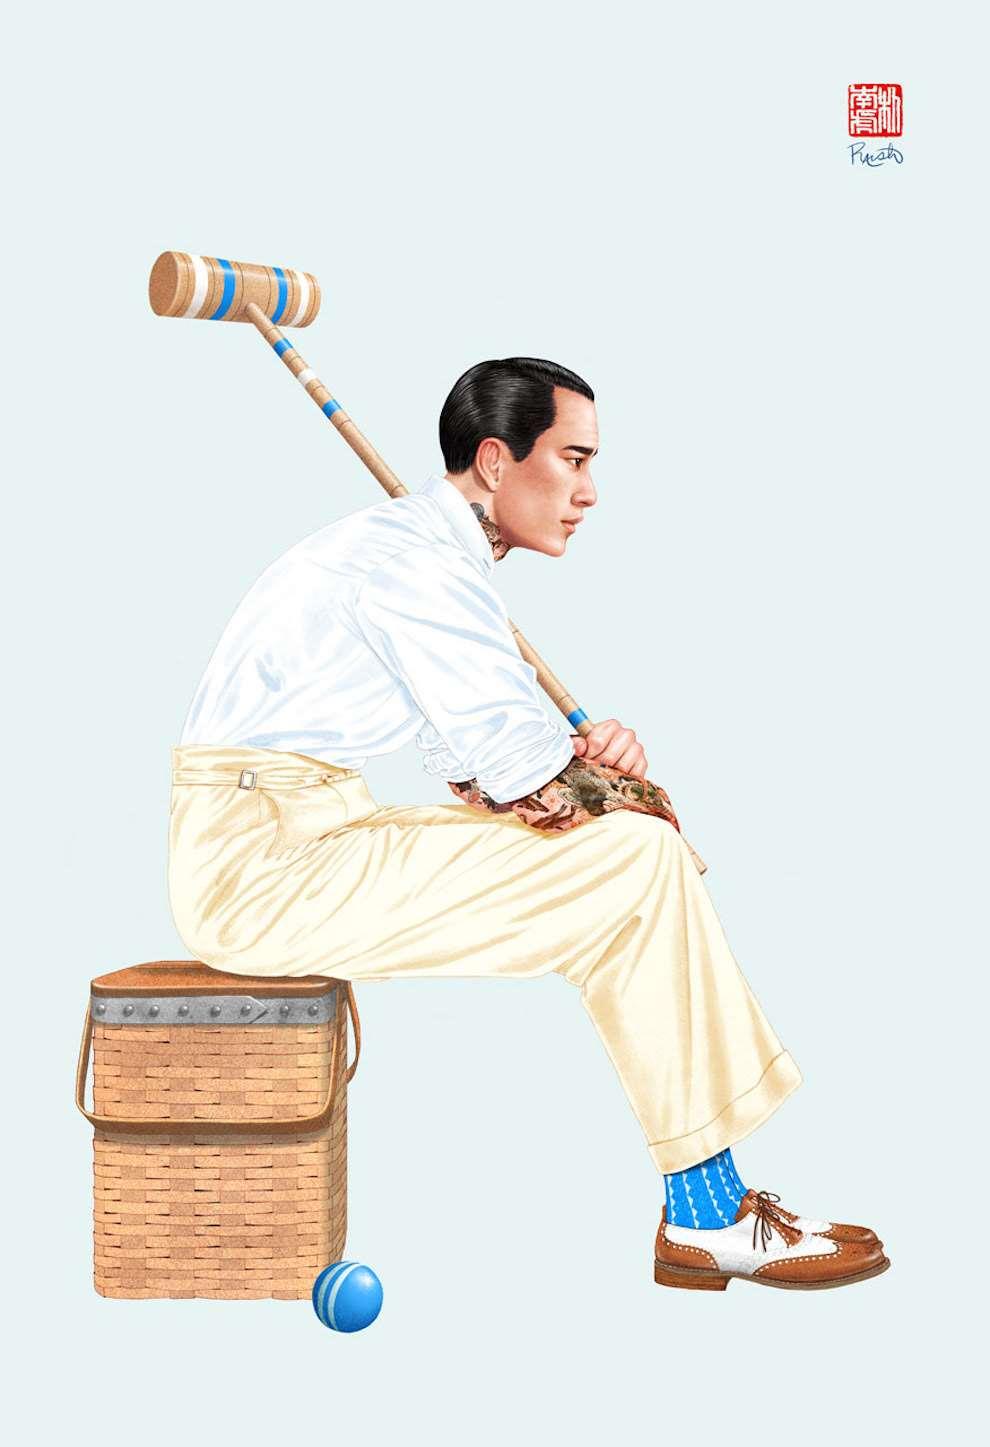 Jason Raish, Tattoed croquet player mens fashion illustration